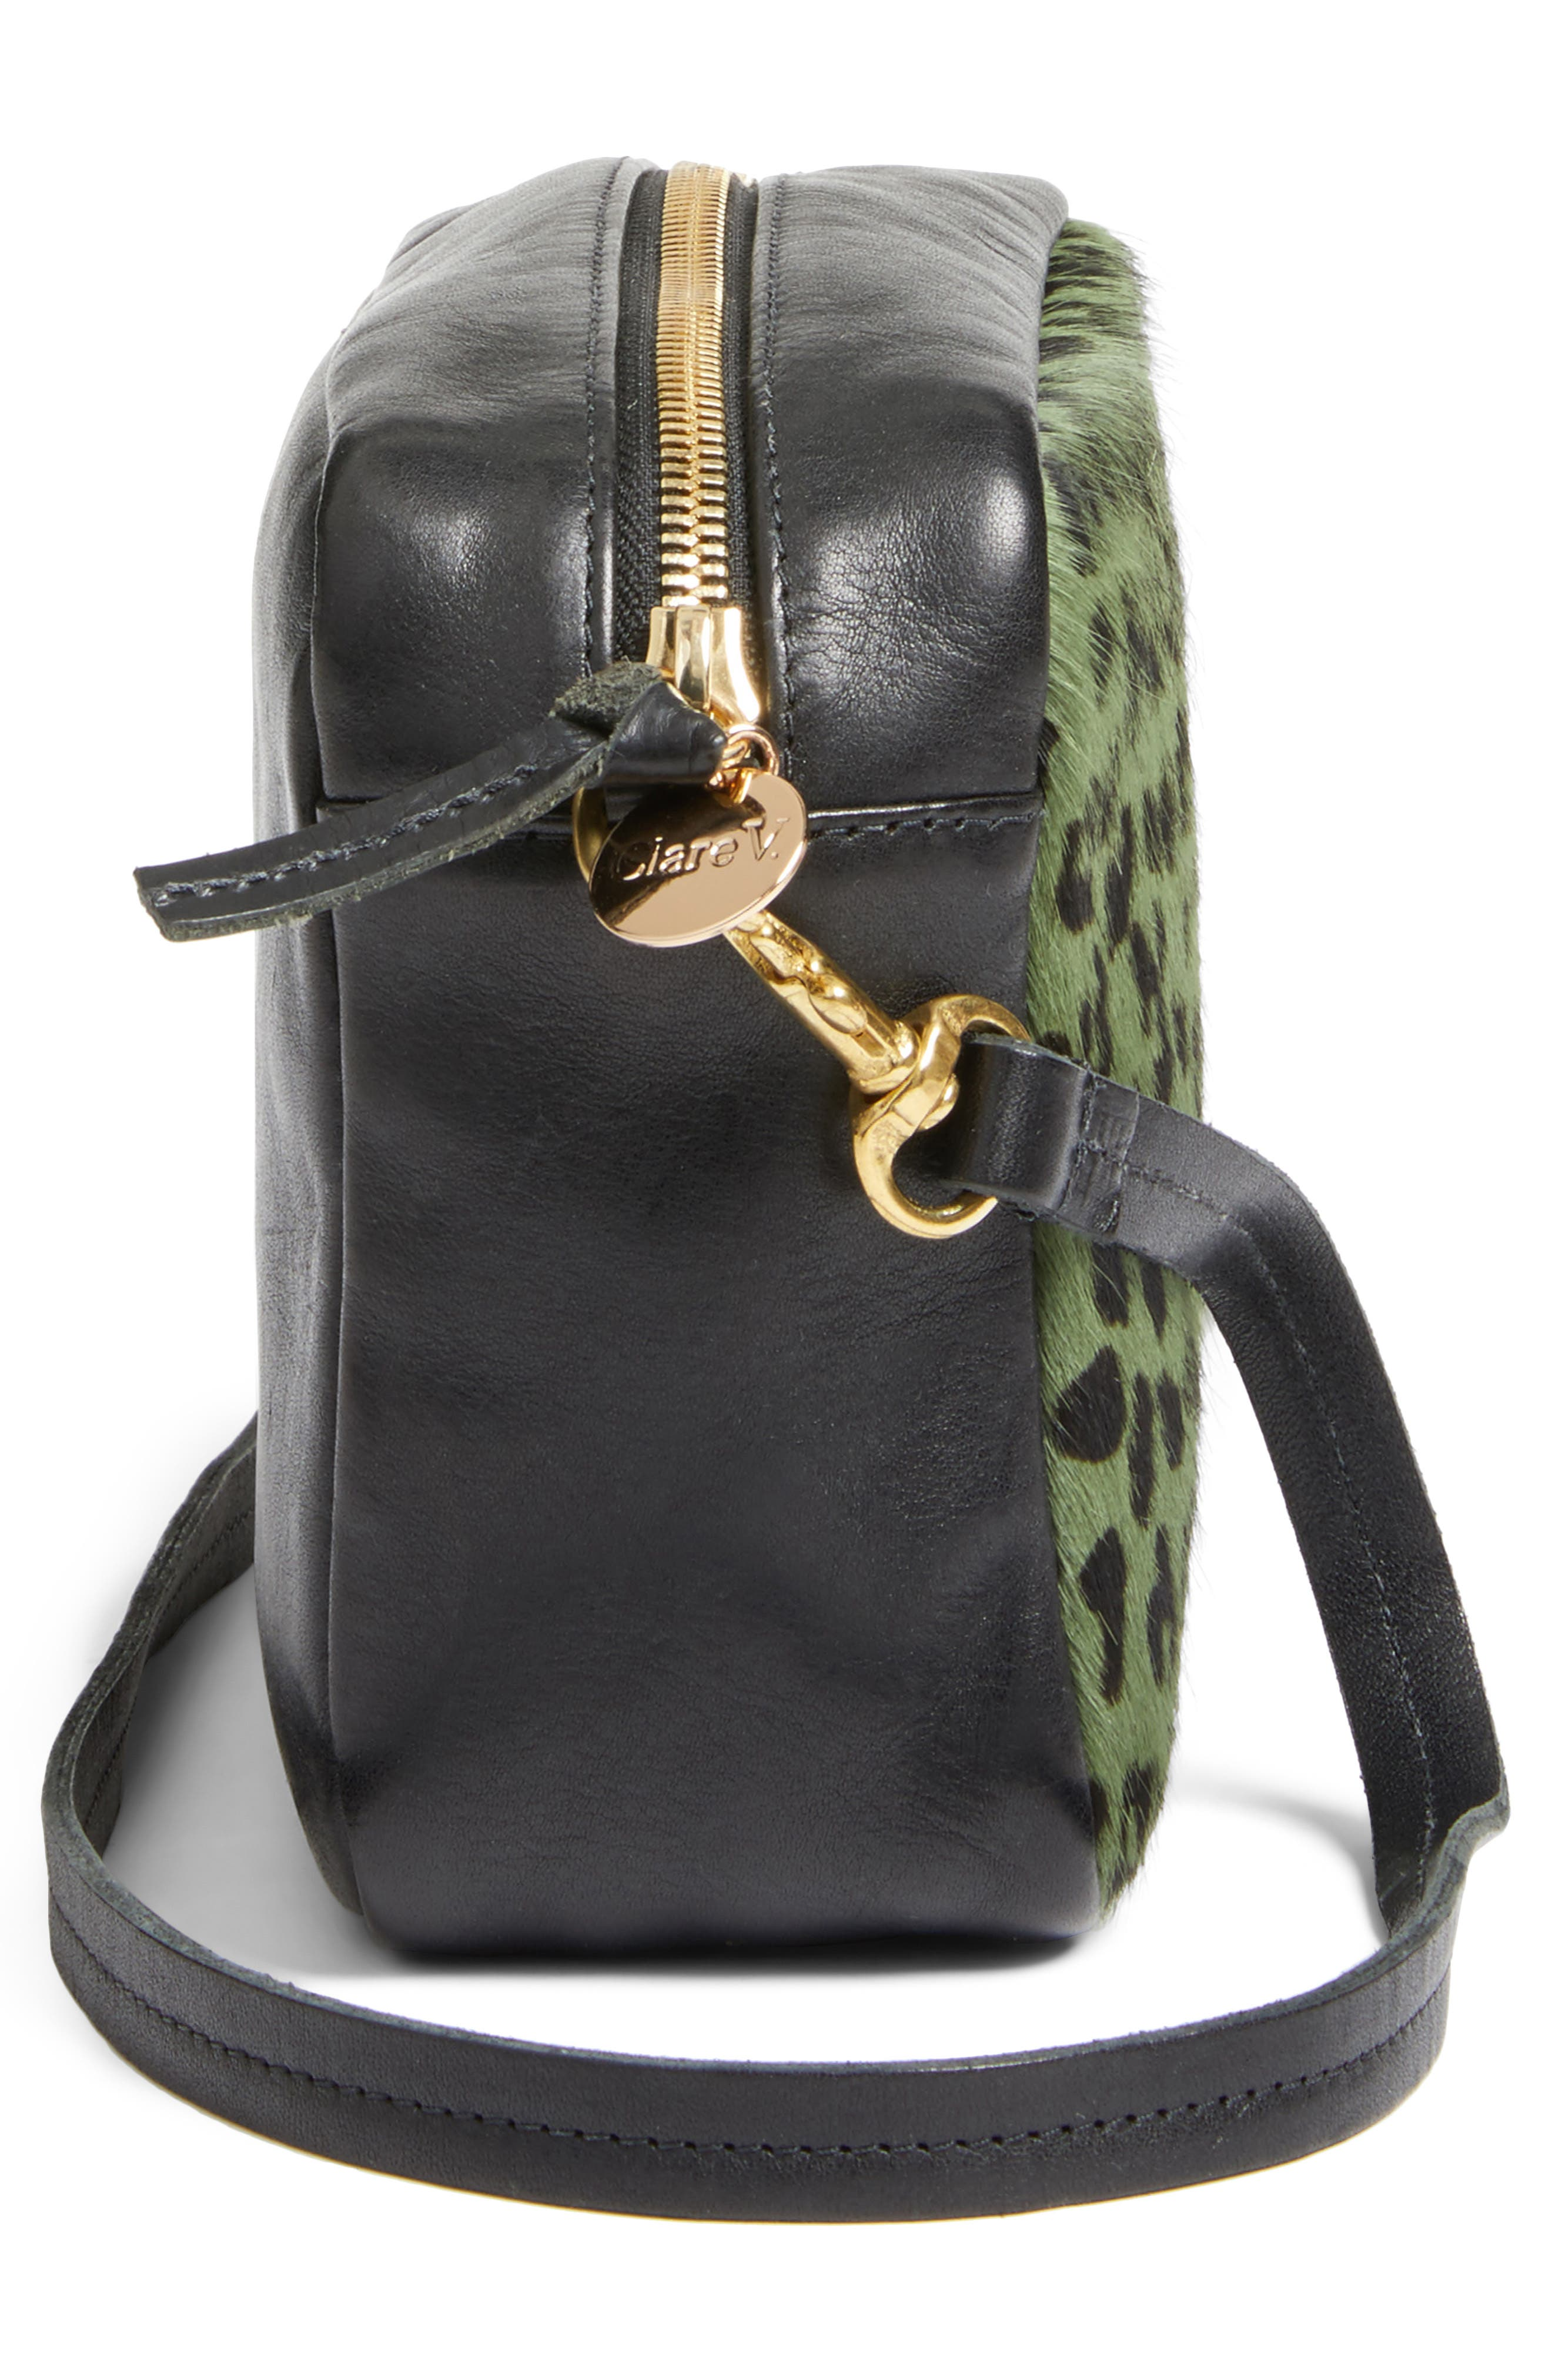 Midi Sac Leather & Genuine Calf Hair Shoulder Bag,                             Alternate thumbnail 5, color,                             Agave Leopard